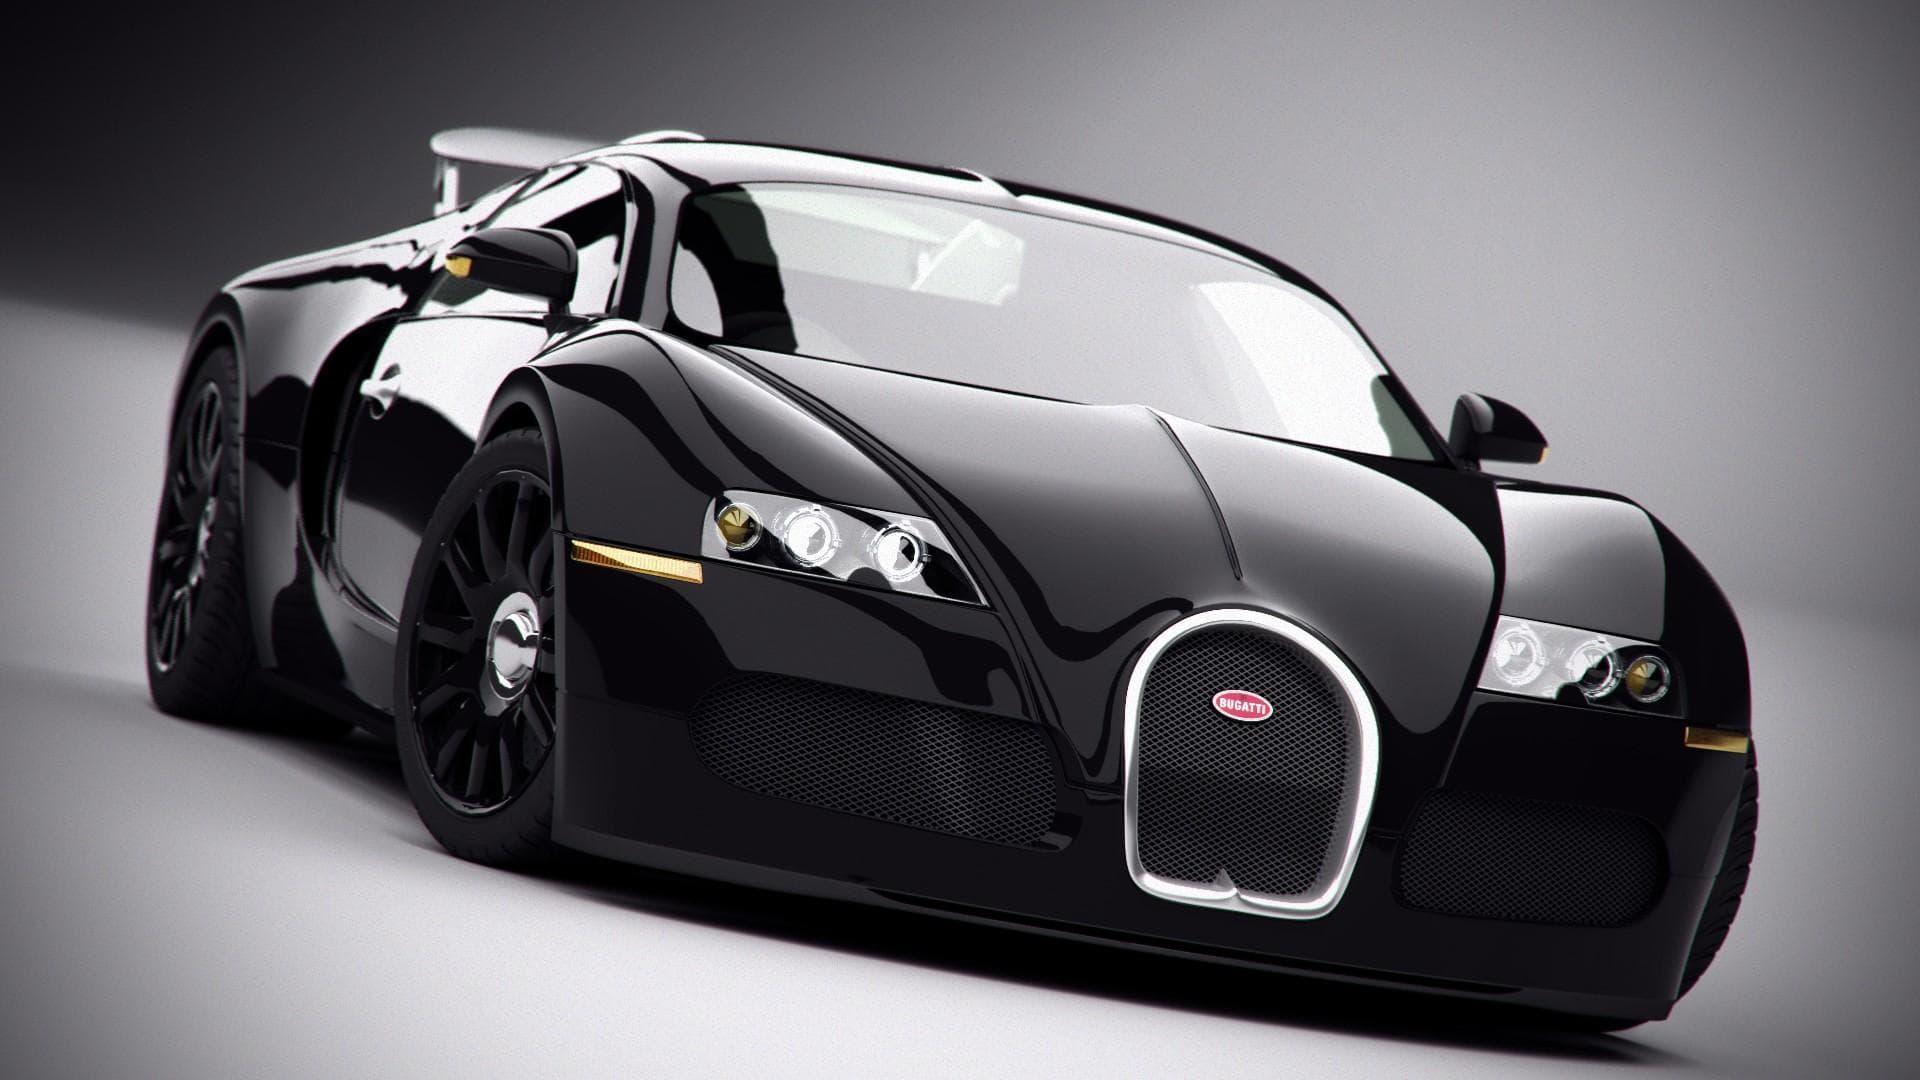 Bugatti Veyron Super Sport Background